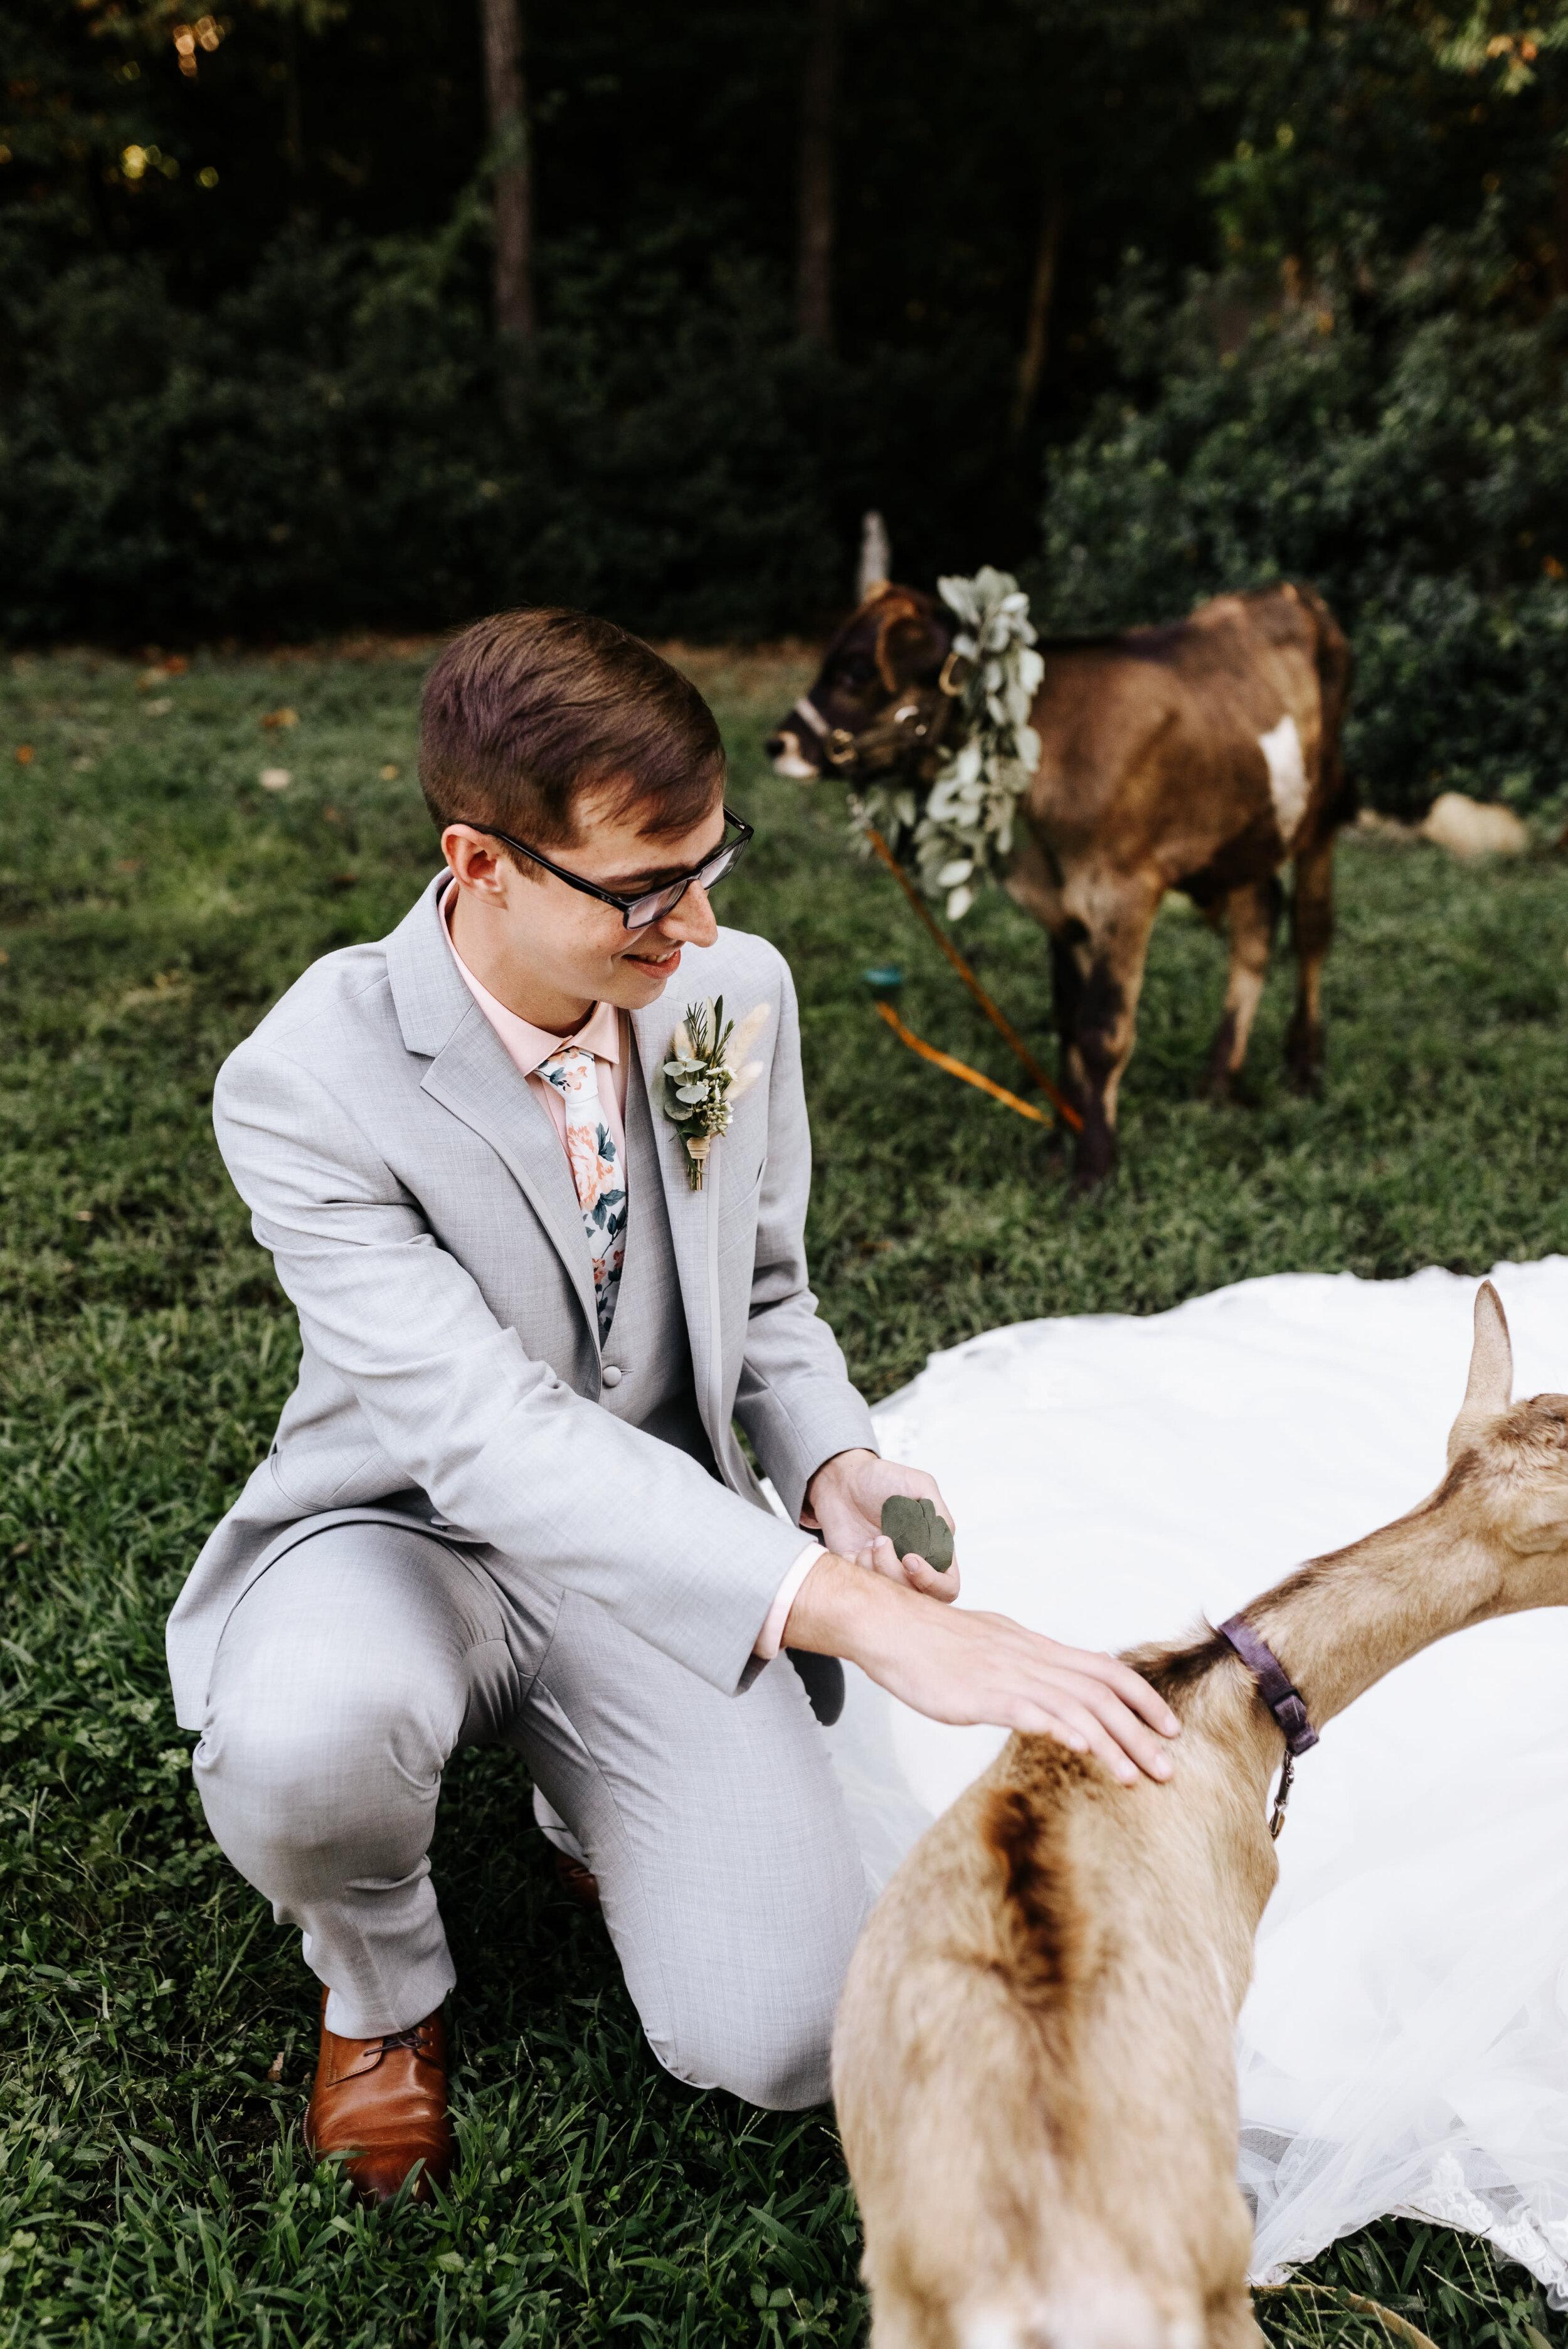 Rachel_David_Wedding_Richmond_Virginia_Photography_by_V_32.jpg